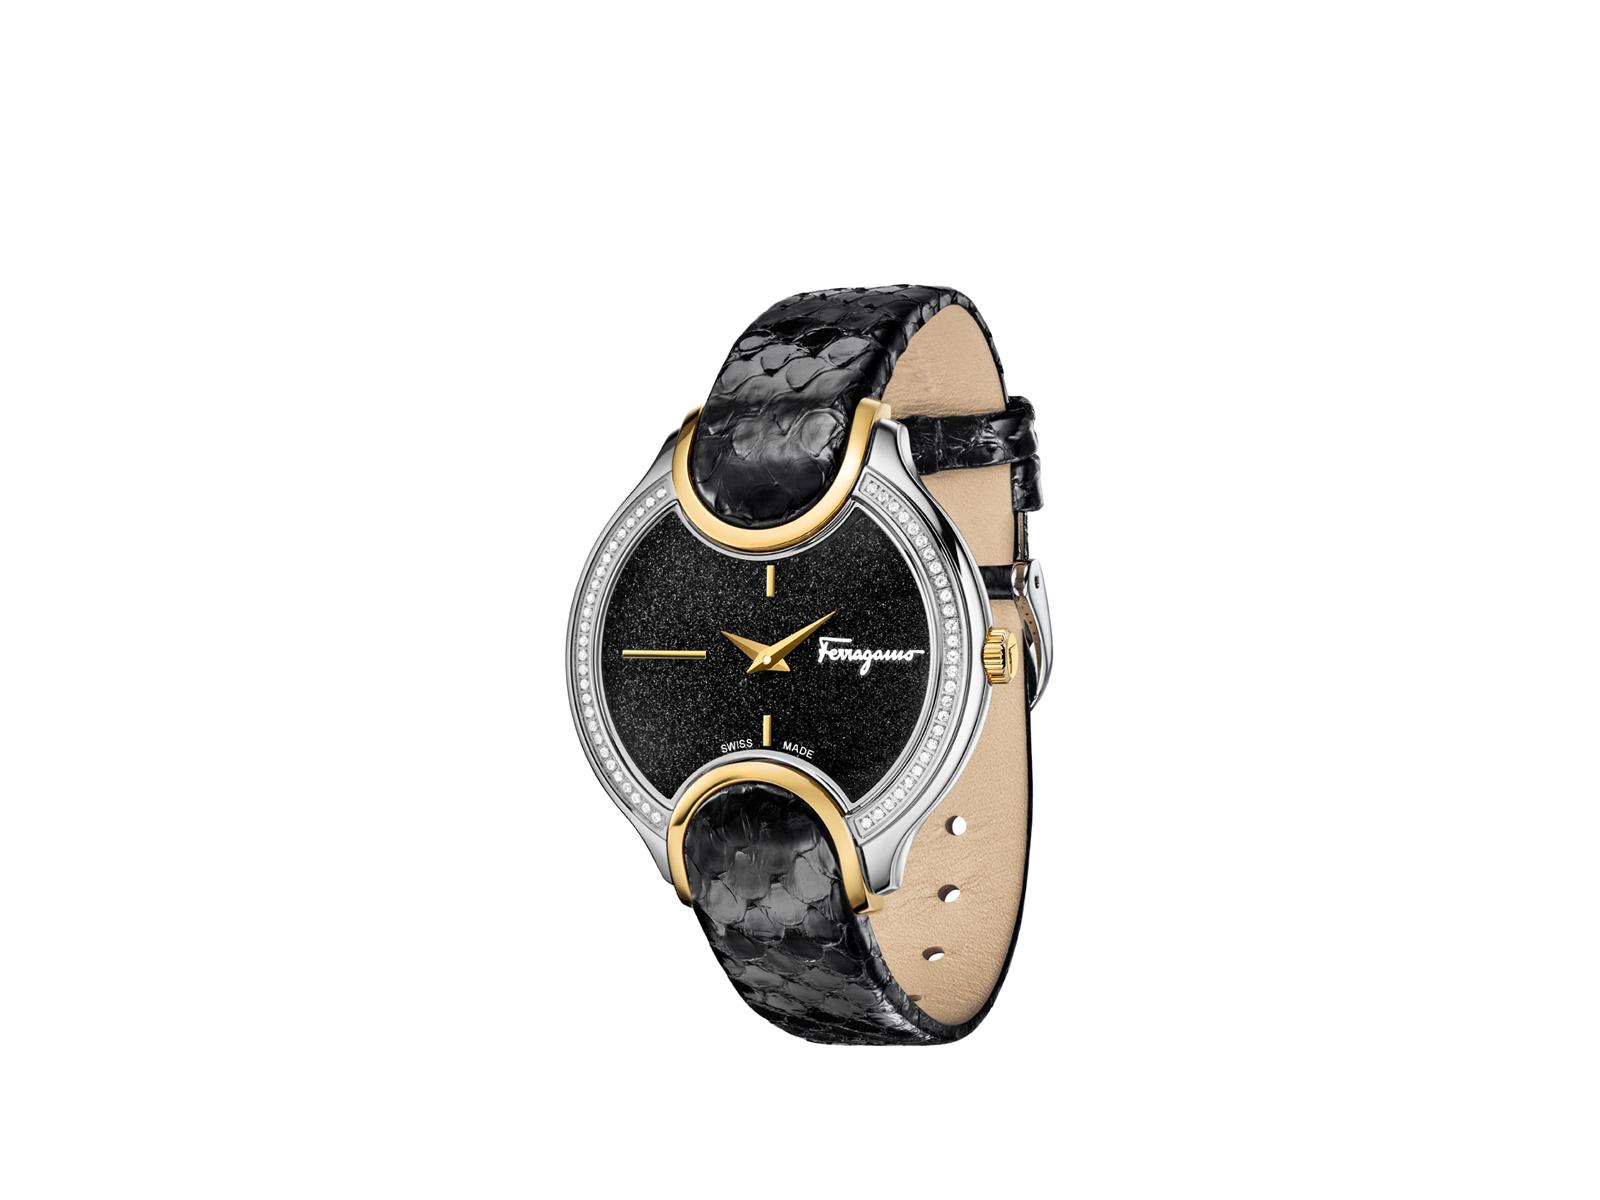 Luxusní hodinky Salvatore Ferragamo Signature Collection